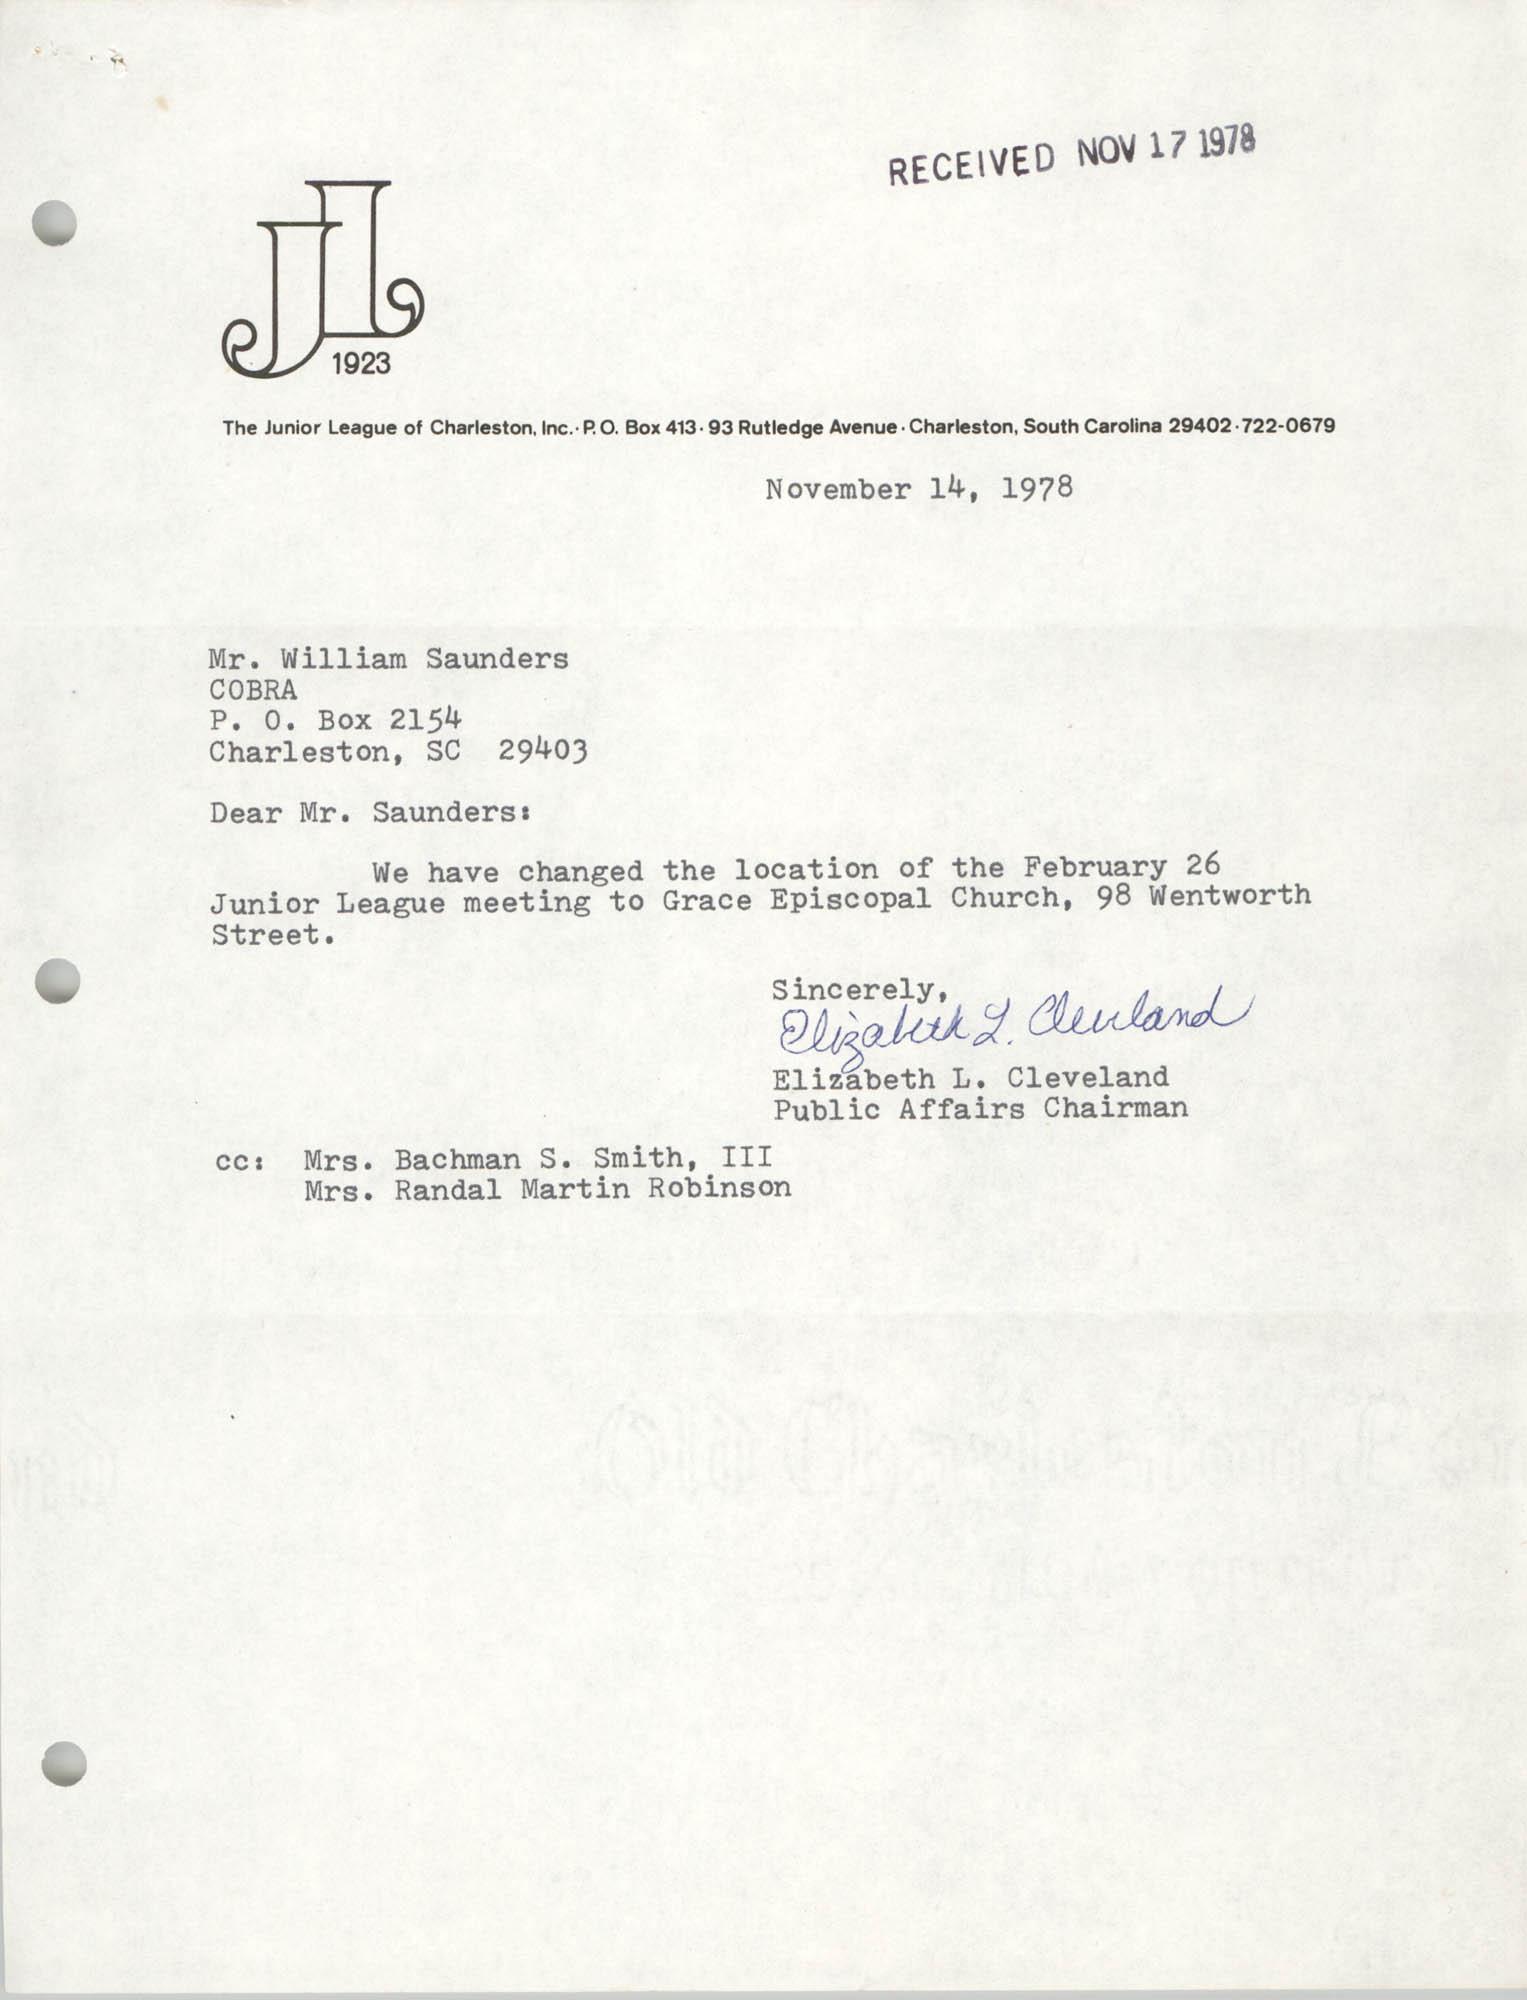 Letter from Elizabeth Cleveland to William Saunders, November 14, 1978